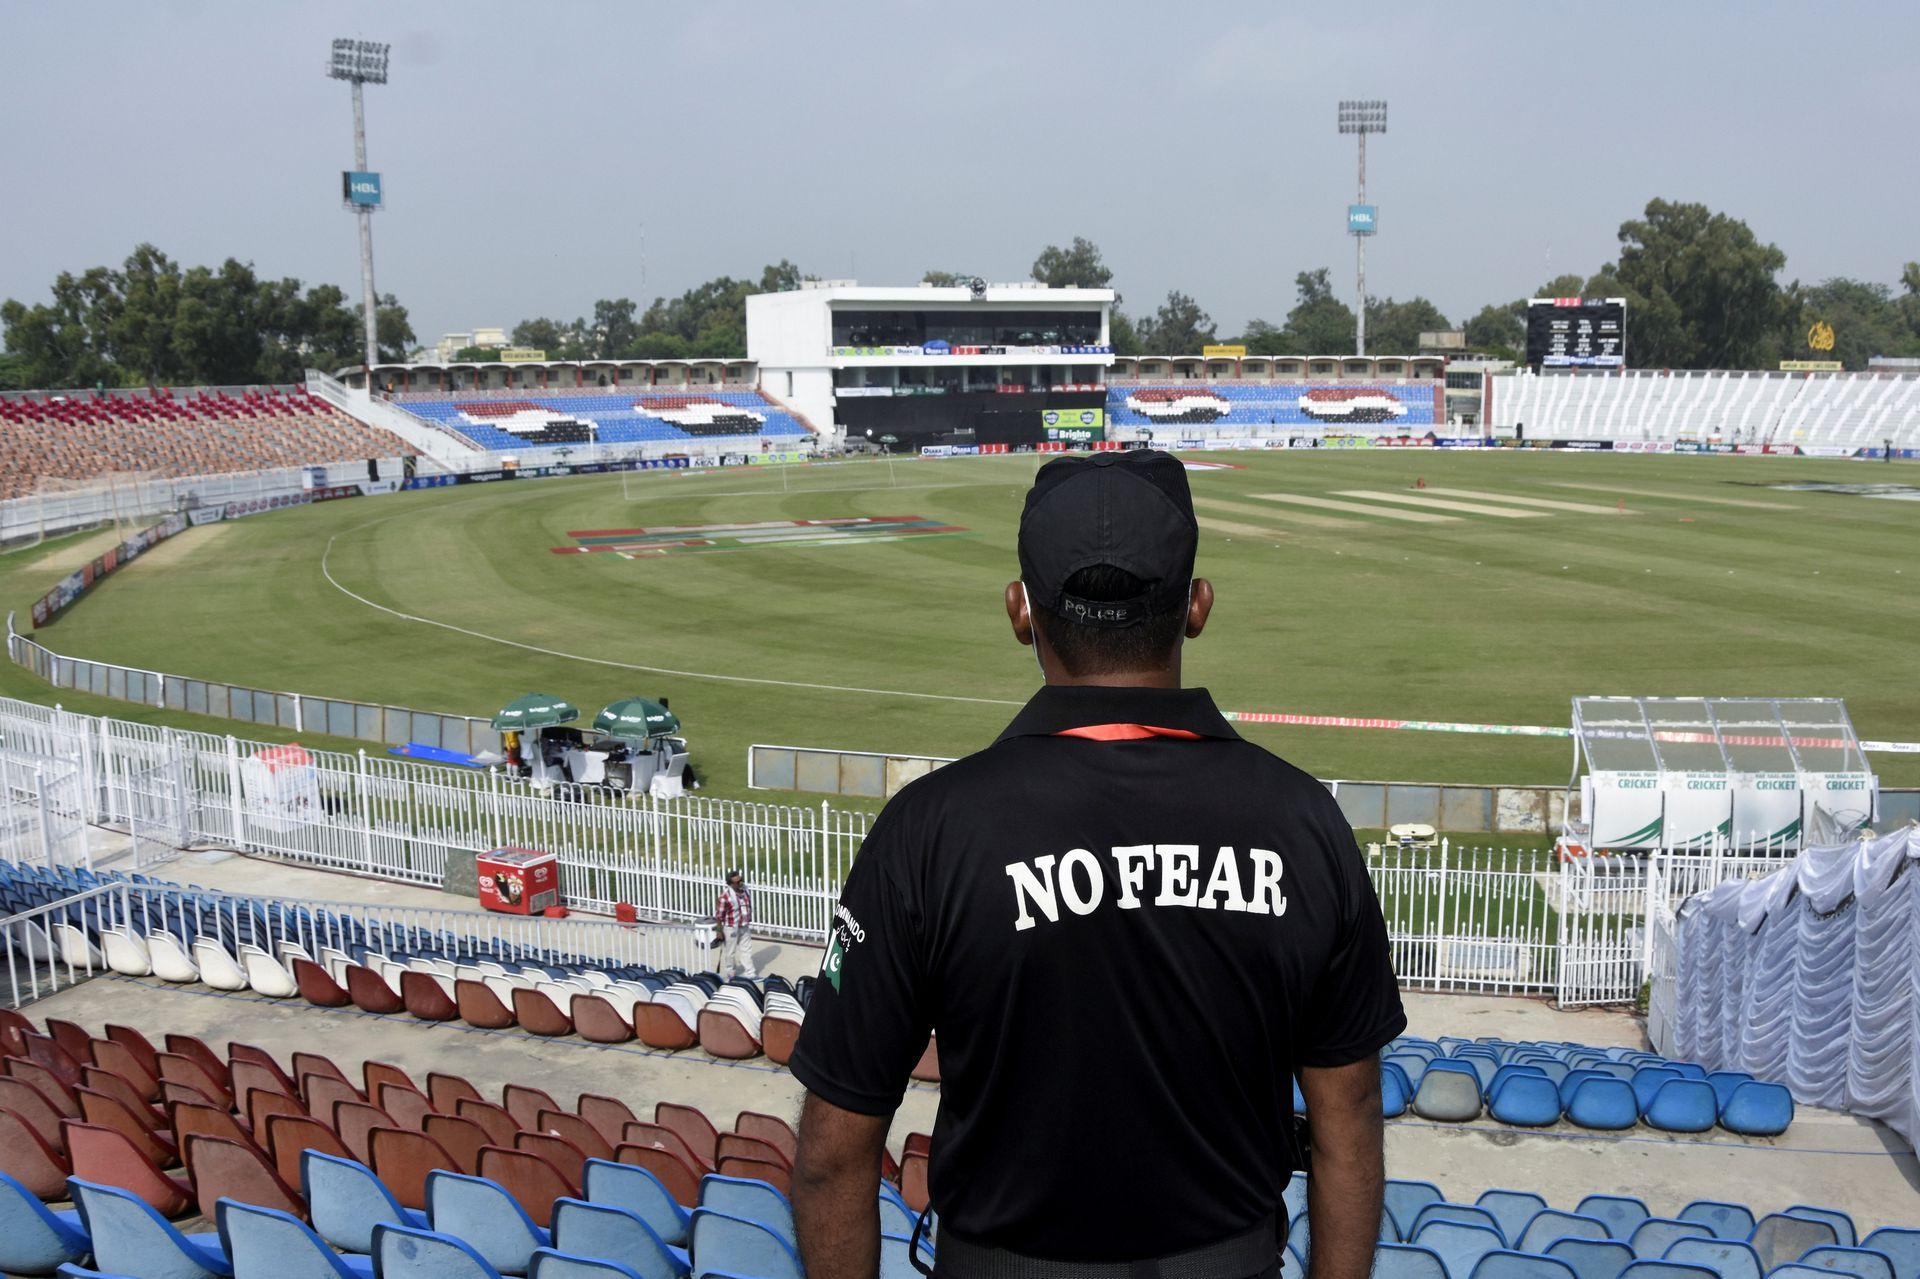 Pakistan says threat to NZ team originated in India